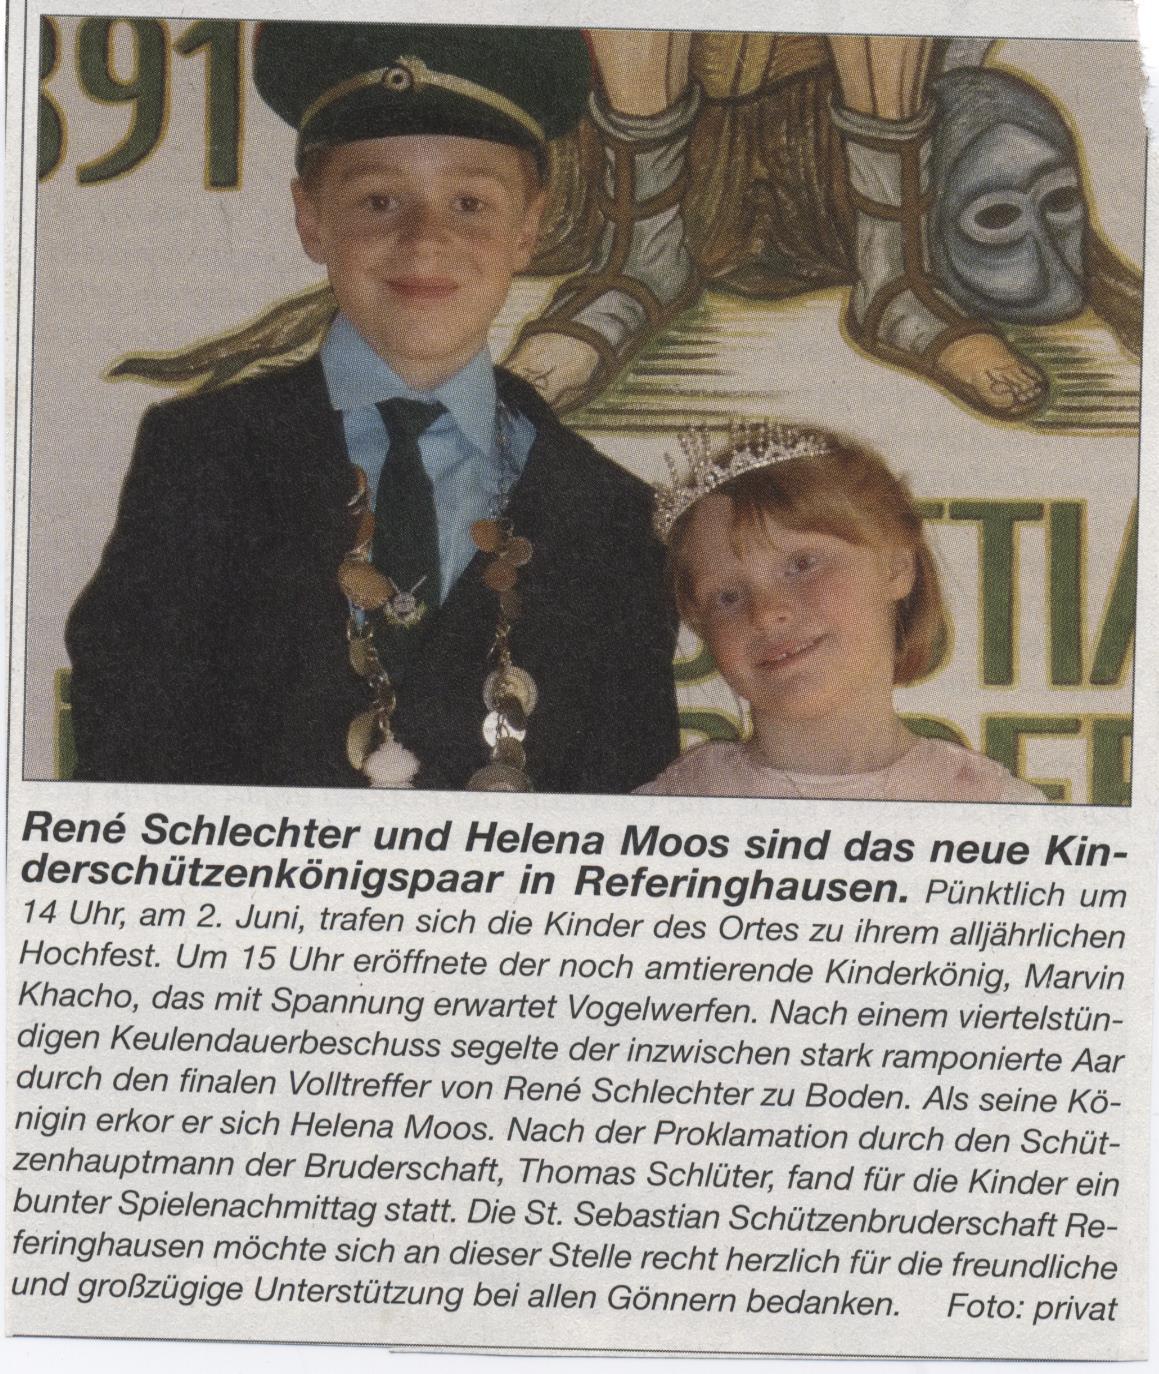 Kinderschützenkönigspaar René und Helena